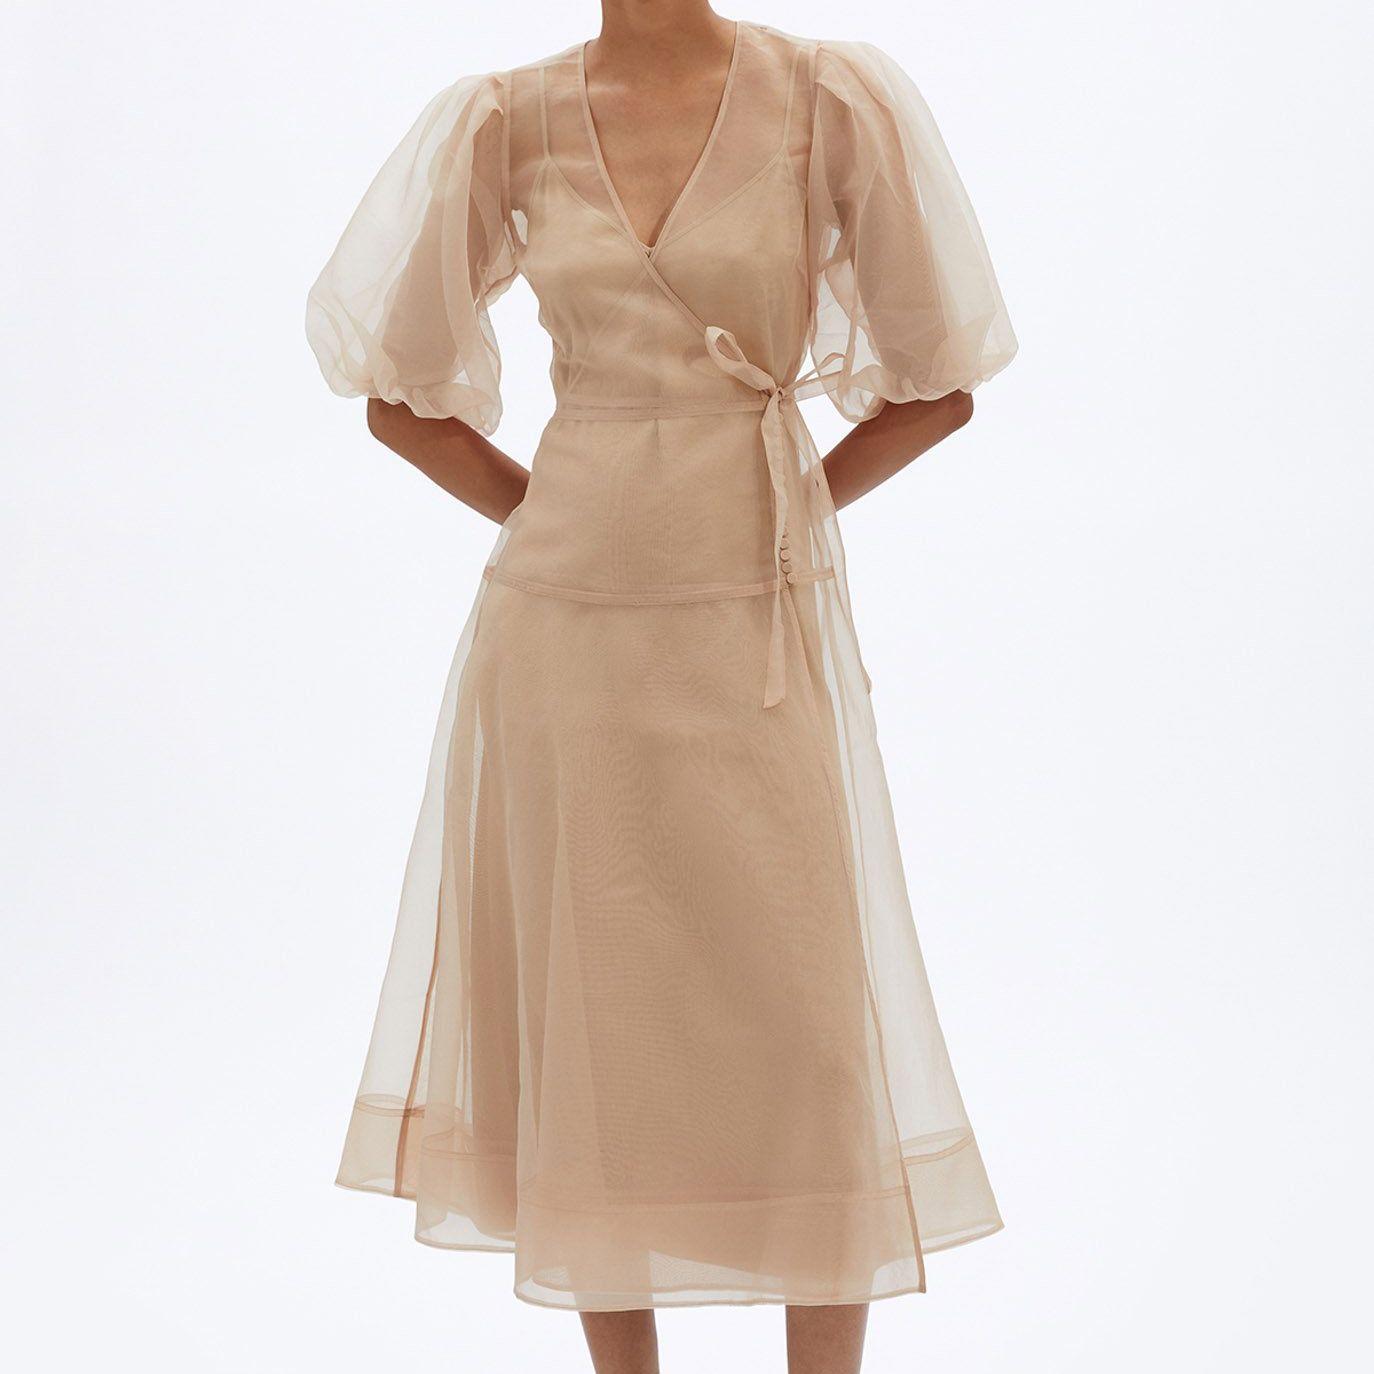 Jonathan Simkhai Lorelai Eco-Organza Midi Dress